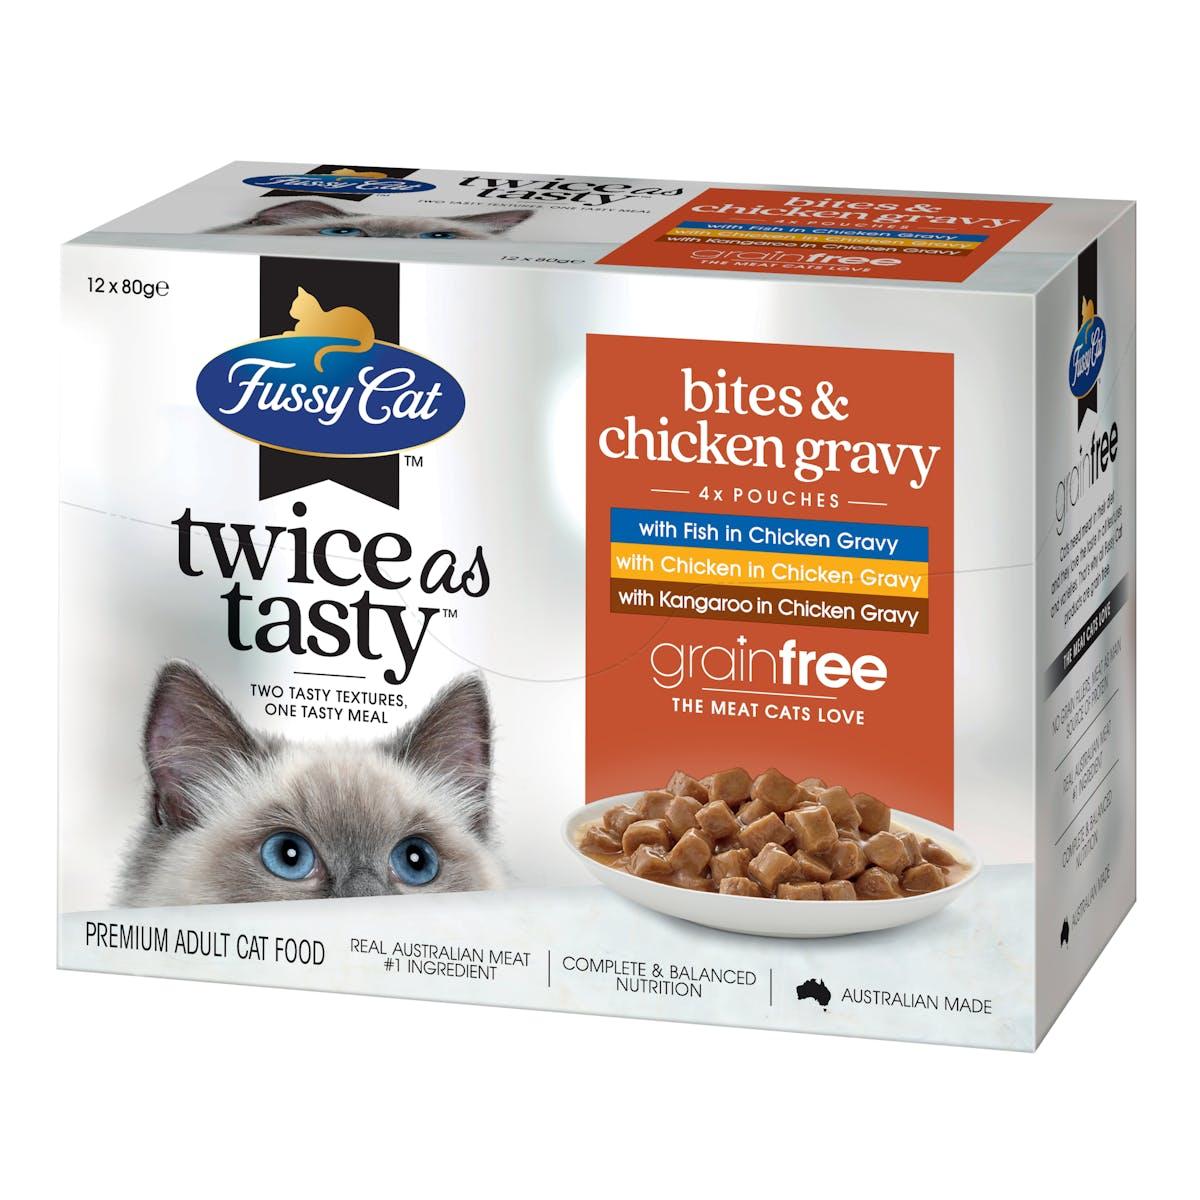 Fussy Cat | Bites & Chicken Gravy | Wet Cat Food | Left of pack